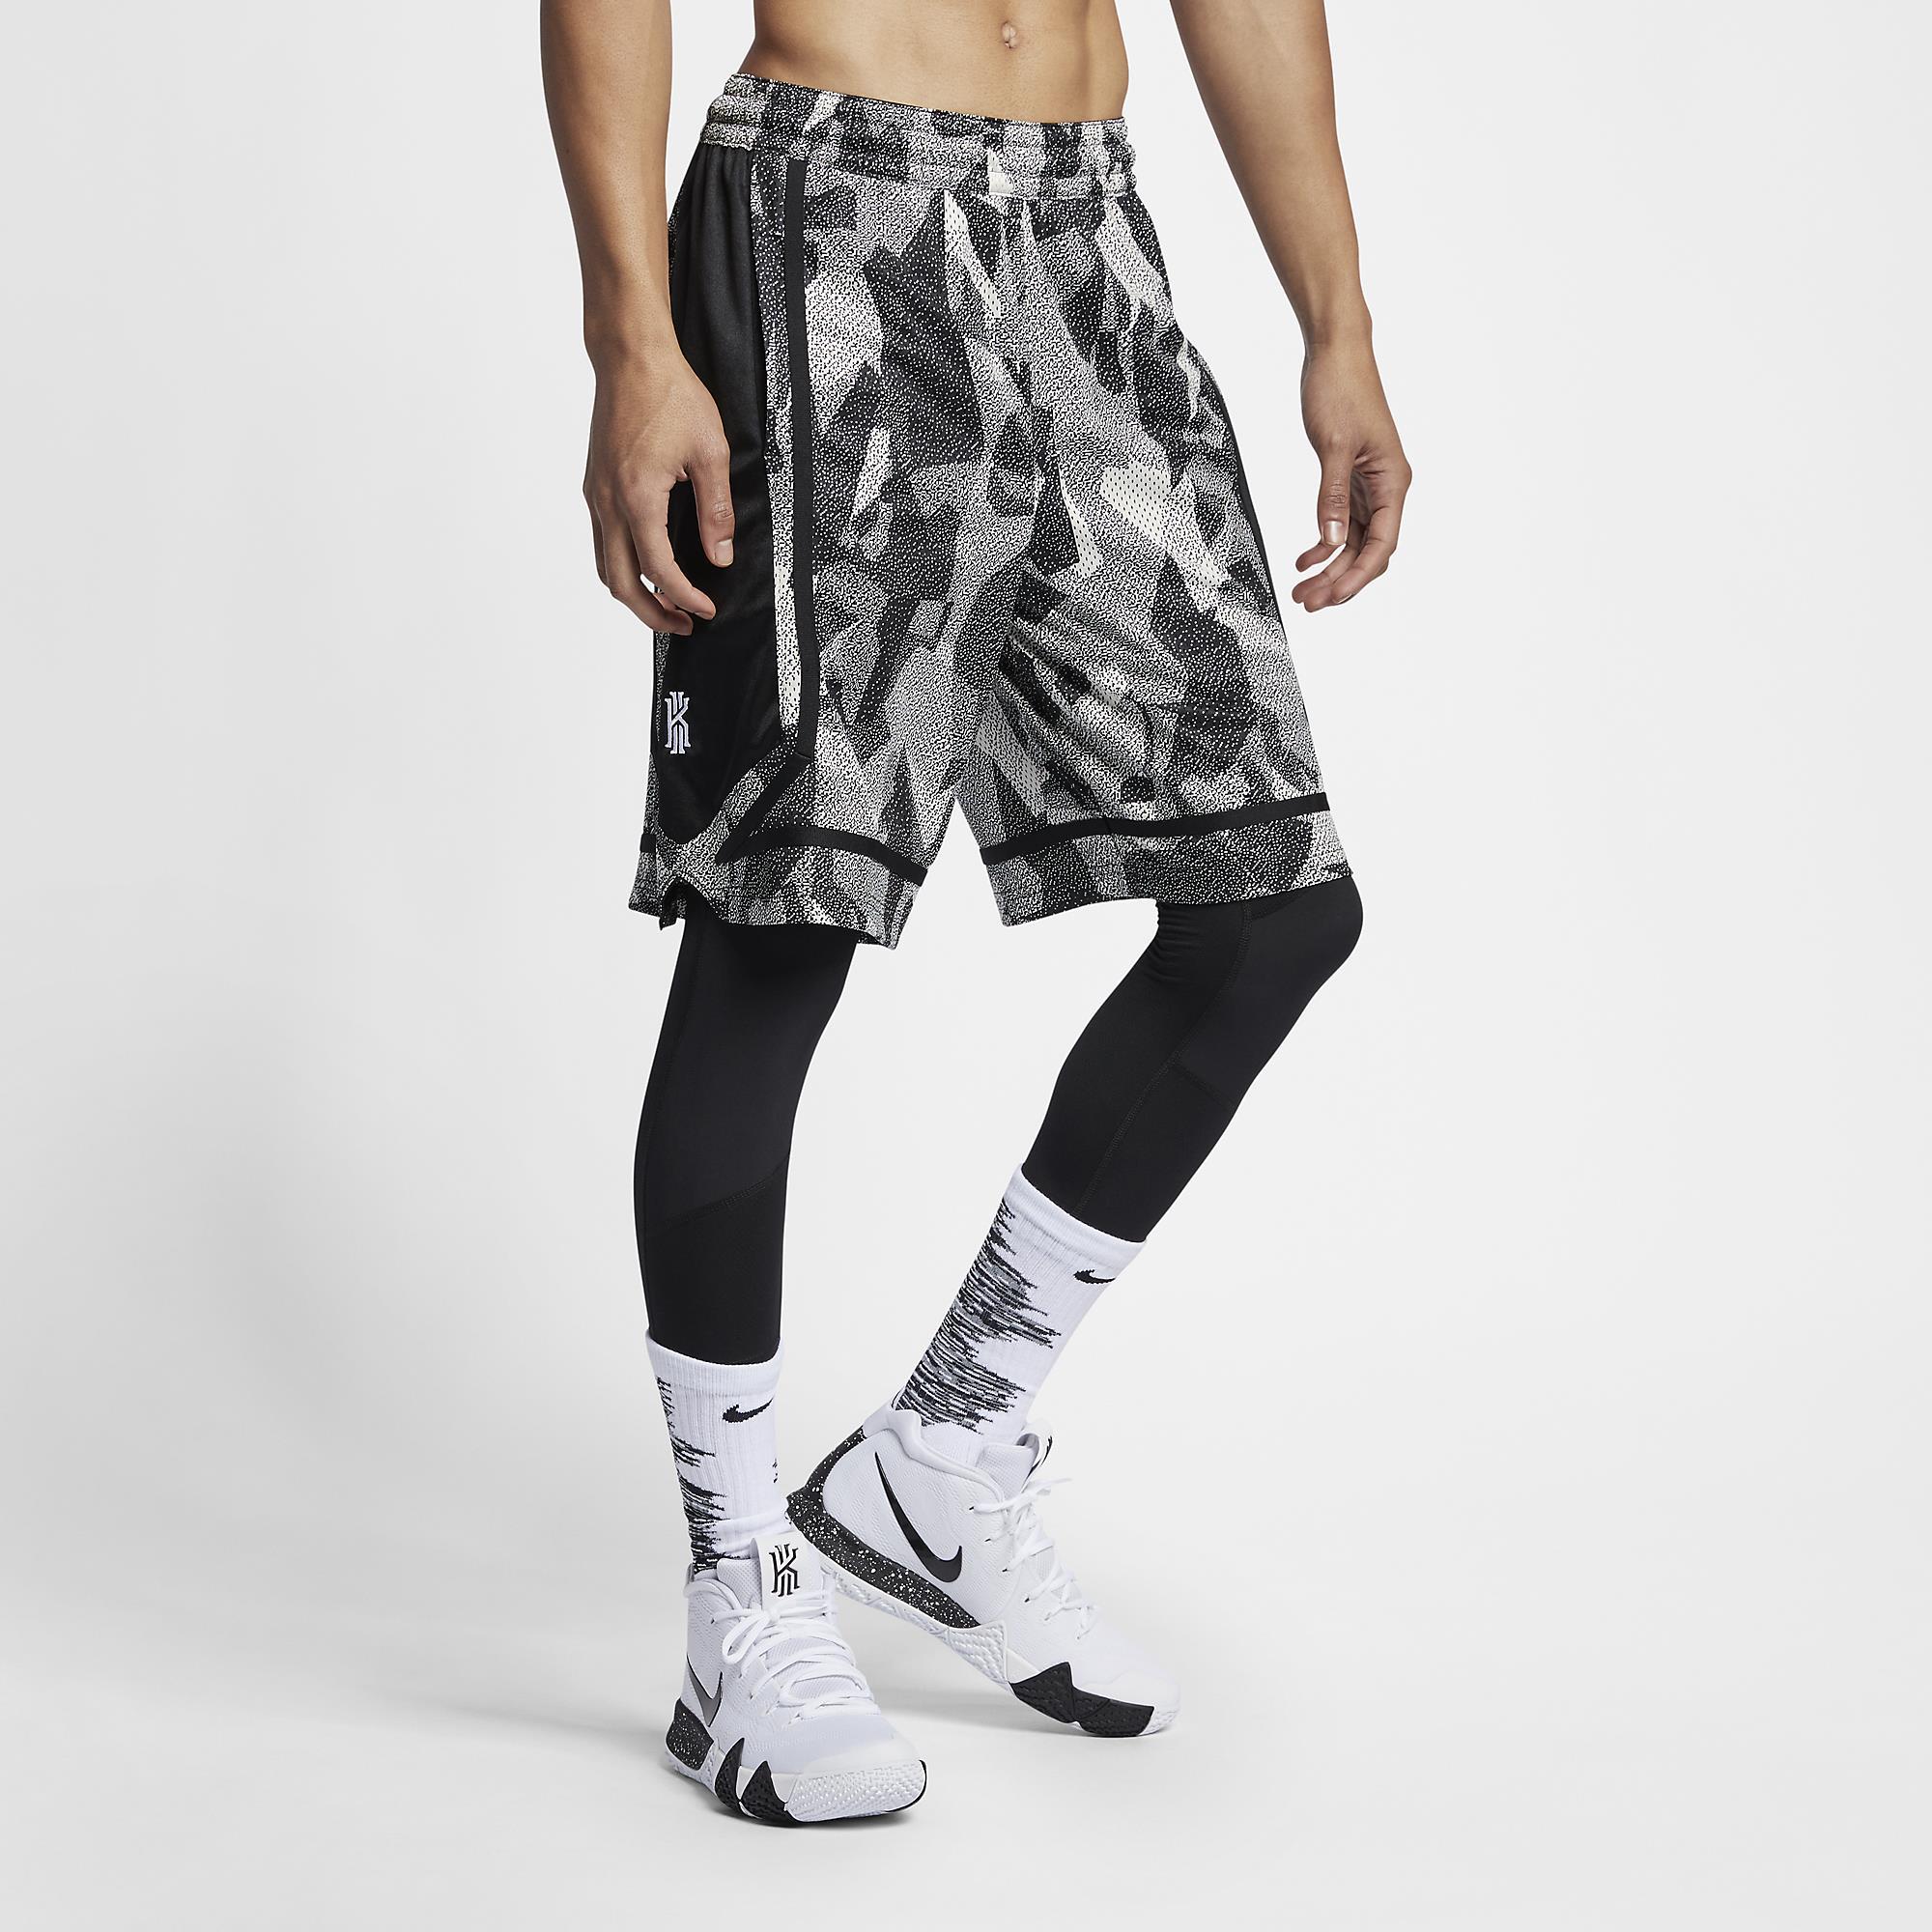 e4ef1dee8 Nike Kyrie Dri-FIT Elite Basketball Shorts - SPORTING GOODS Basketball  Shorts